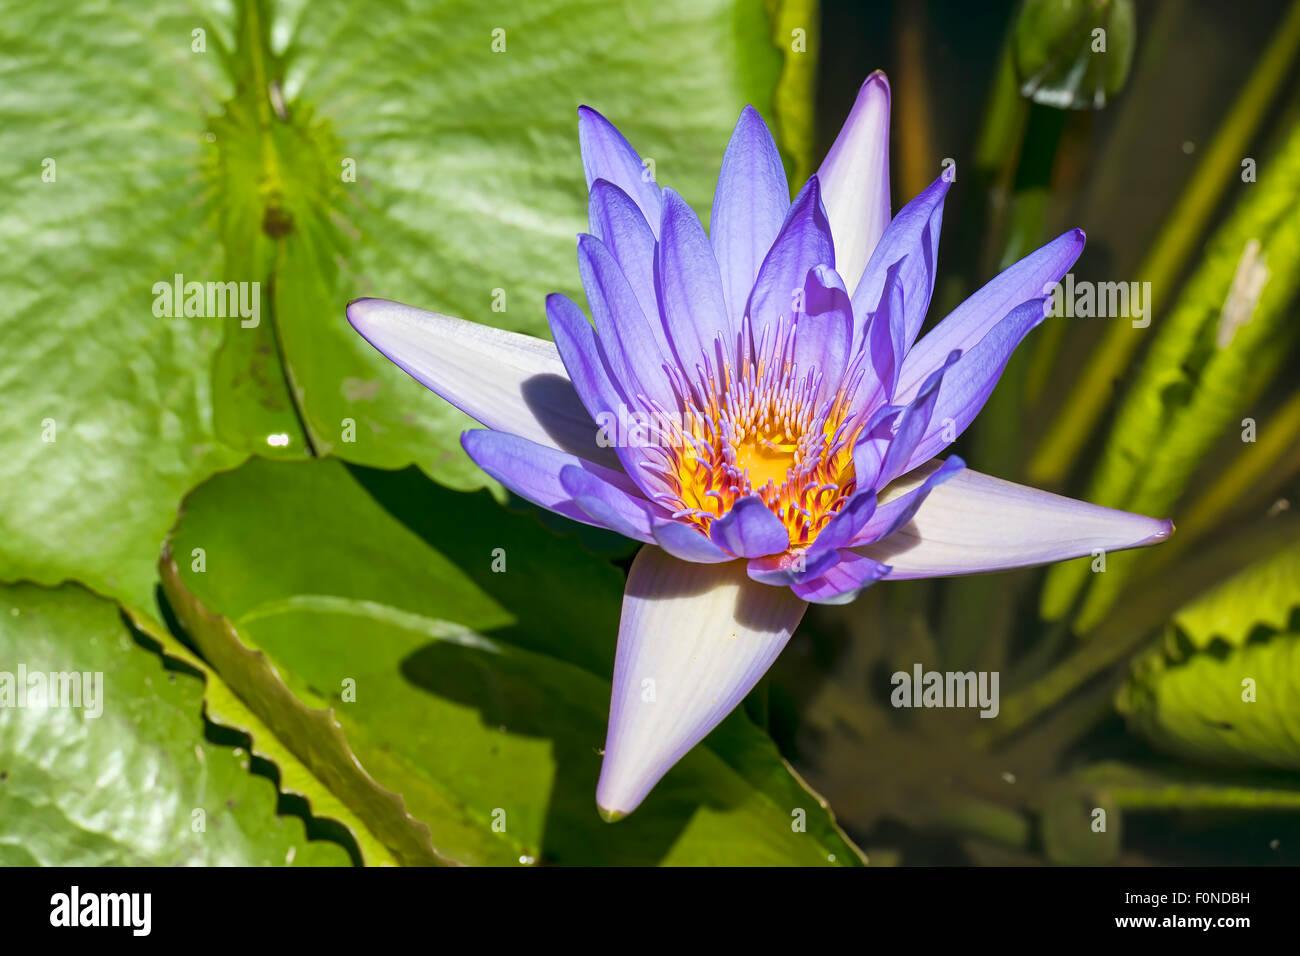 Lotus flower (Nelumbo), Mauritius - Stock Image